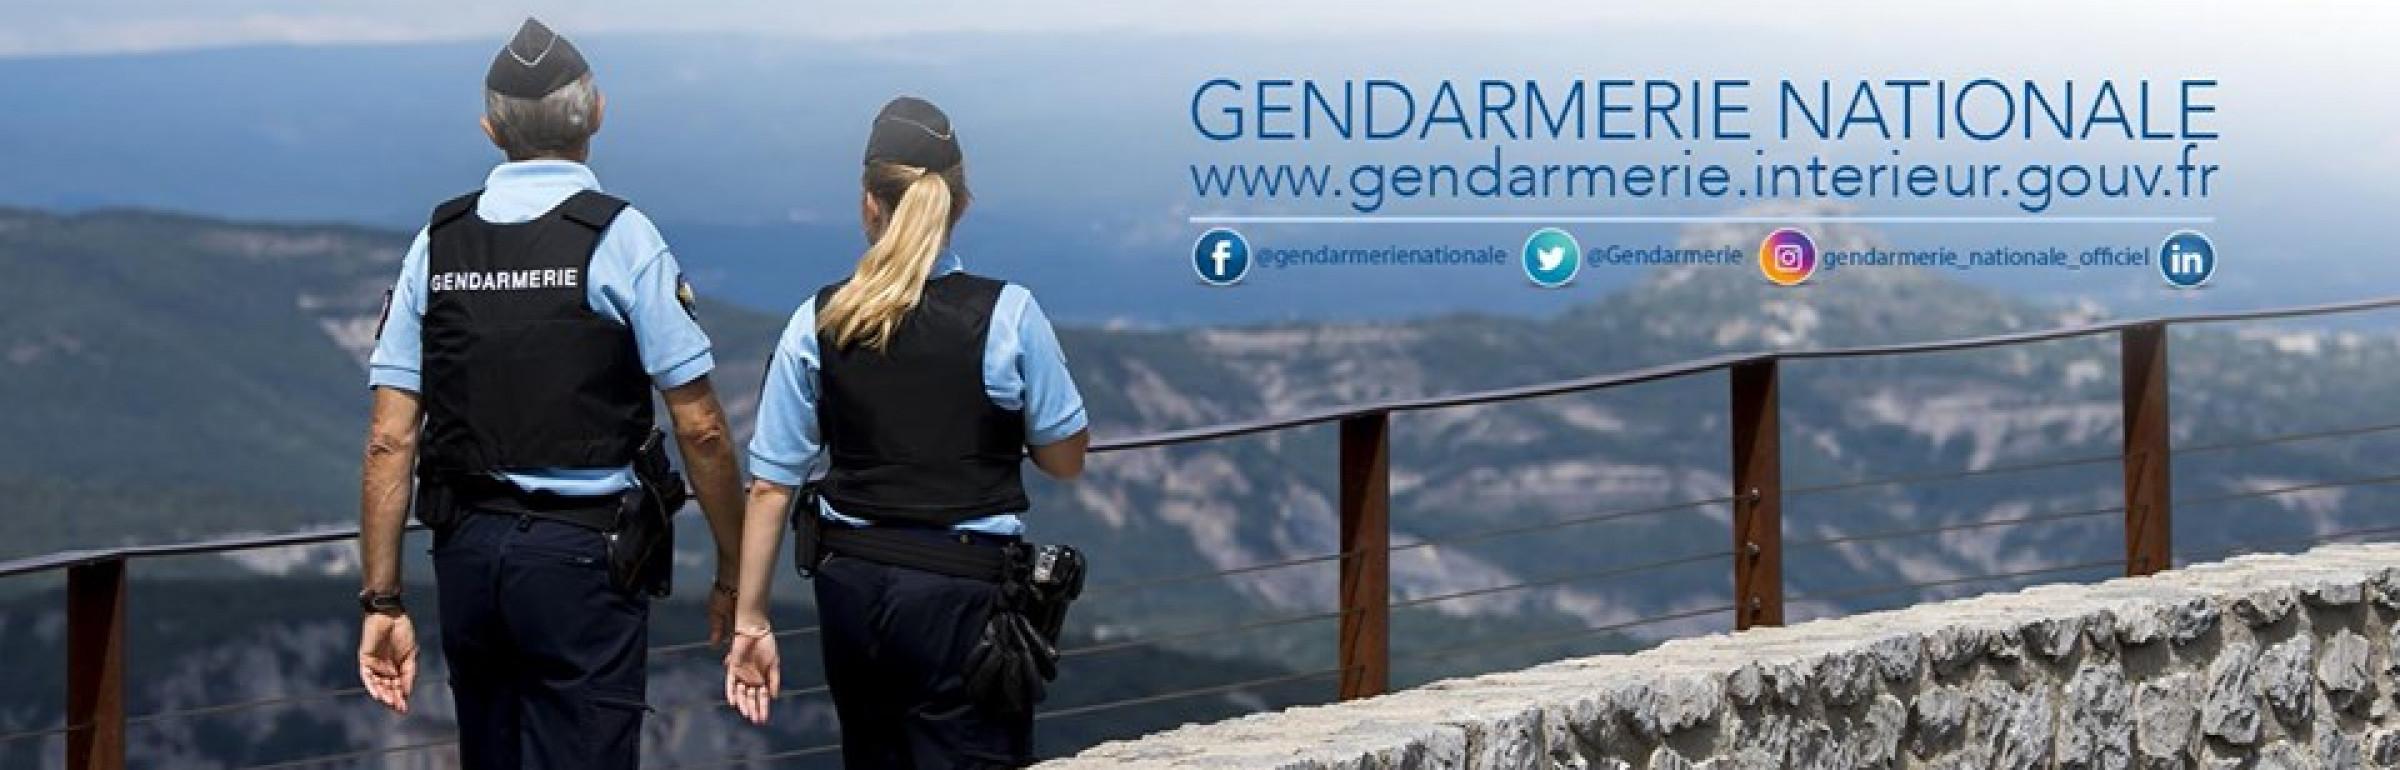 Banner Gendarmerie Nationale (cir Metz)